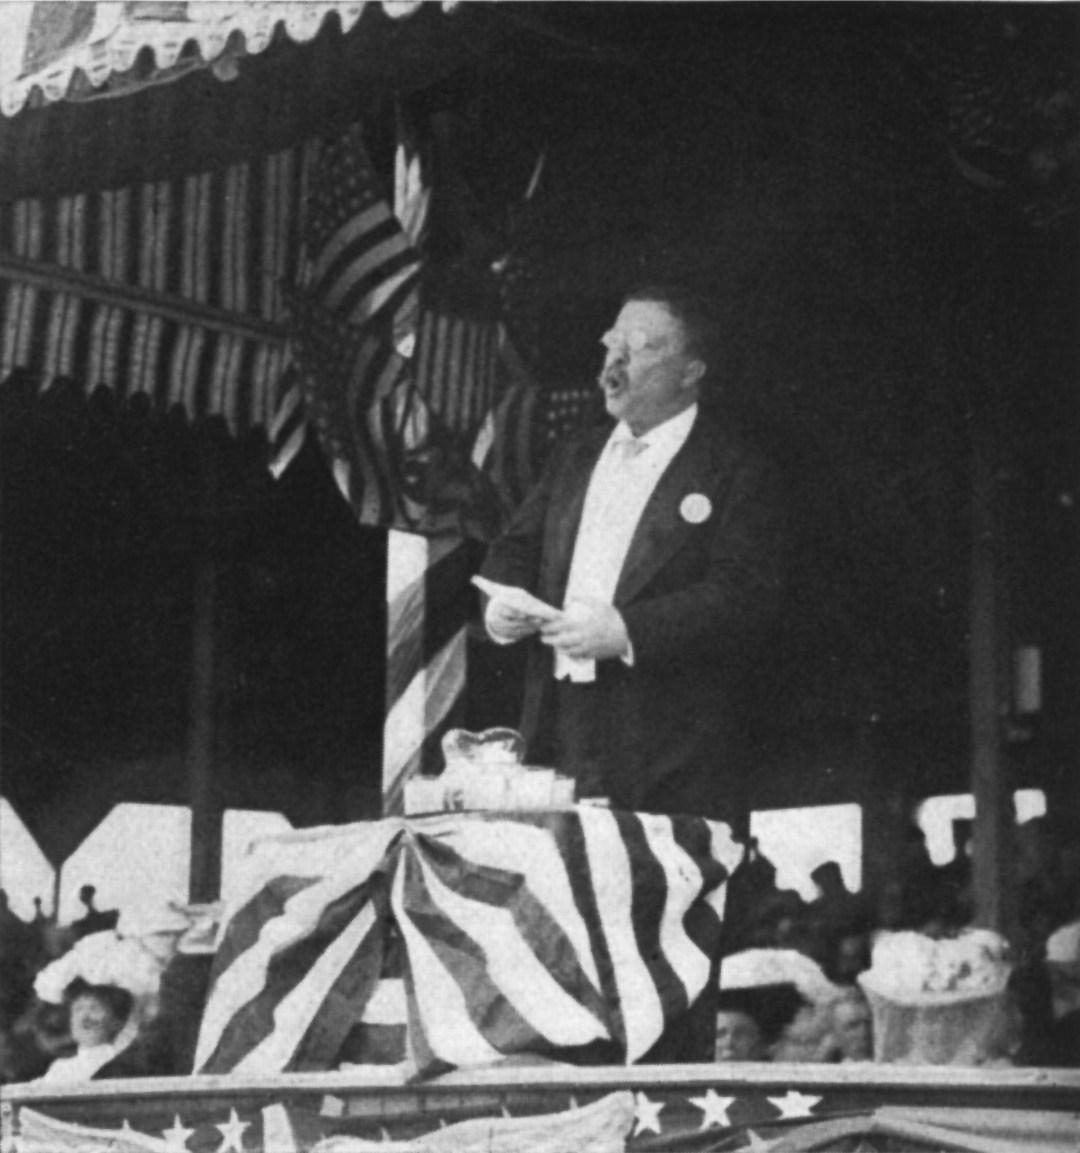 07MCJamestown Exposition00019PH - President Theodore Roosevelt copy